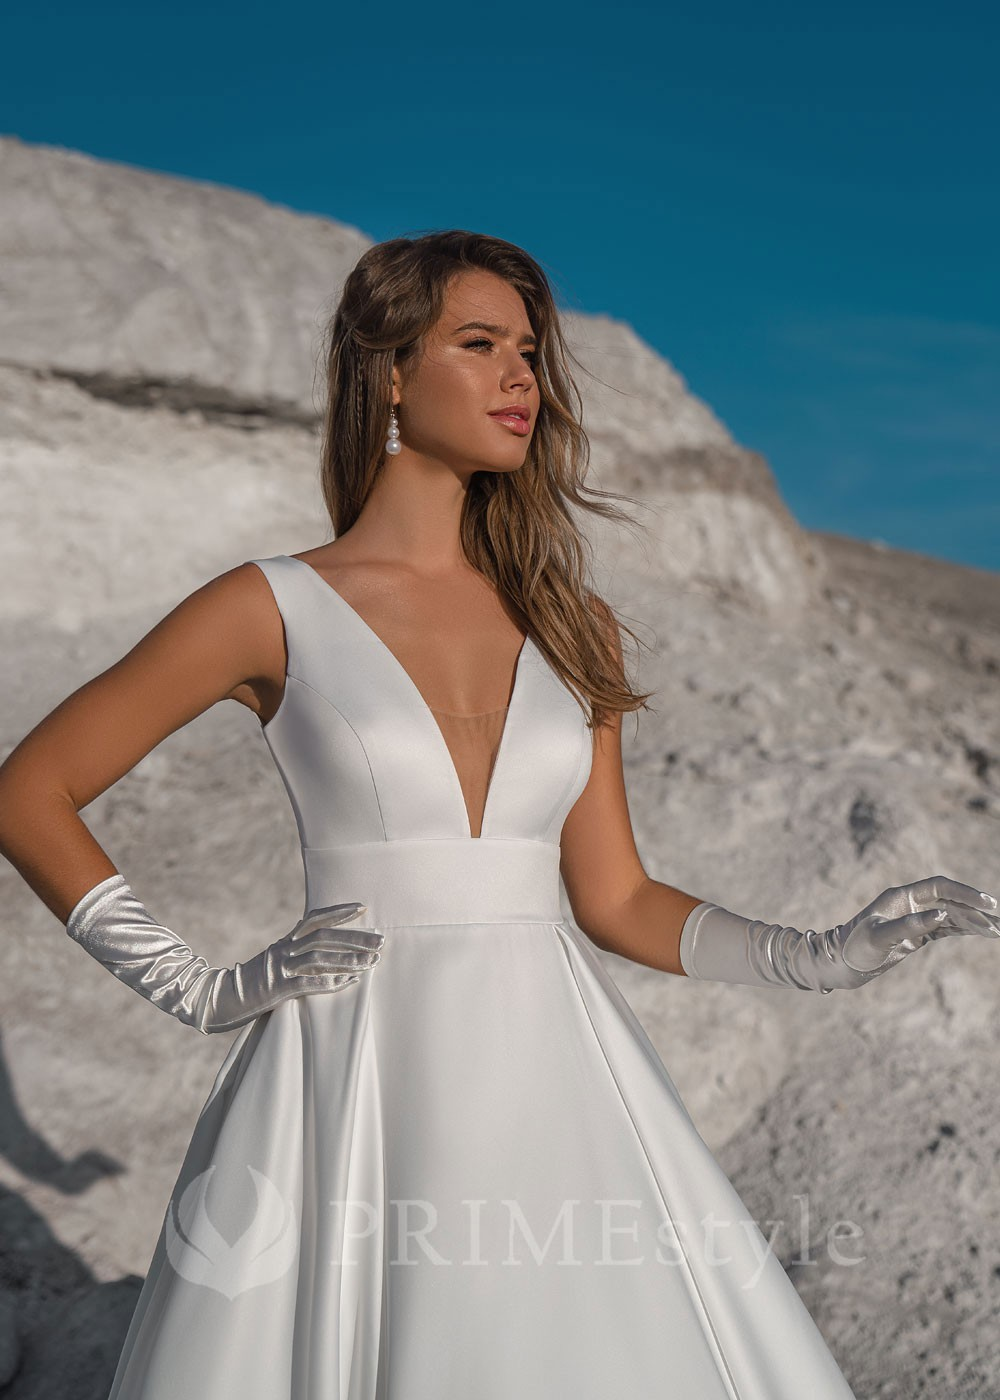 a238b8c4fc16 Extravagantné svadobné šaty Belissa - lamode.sk